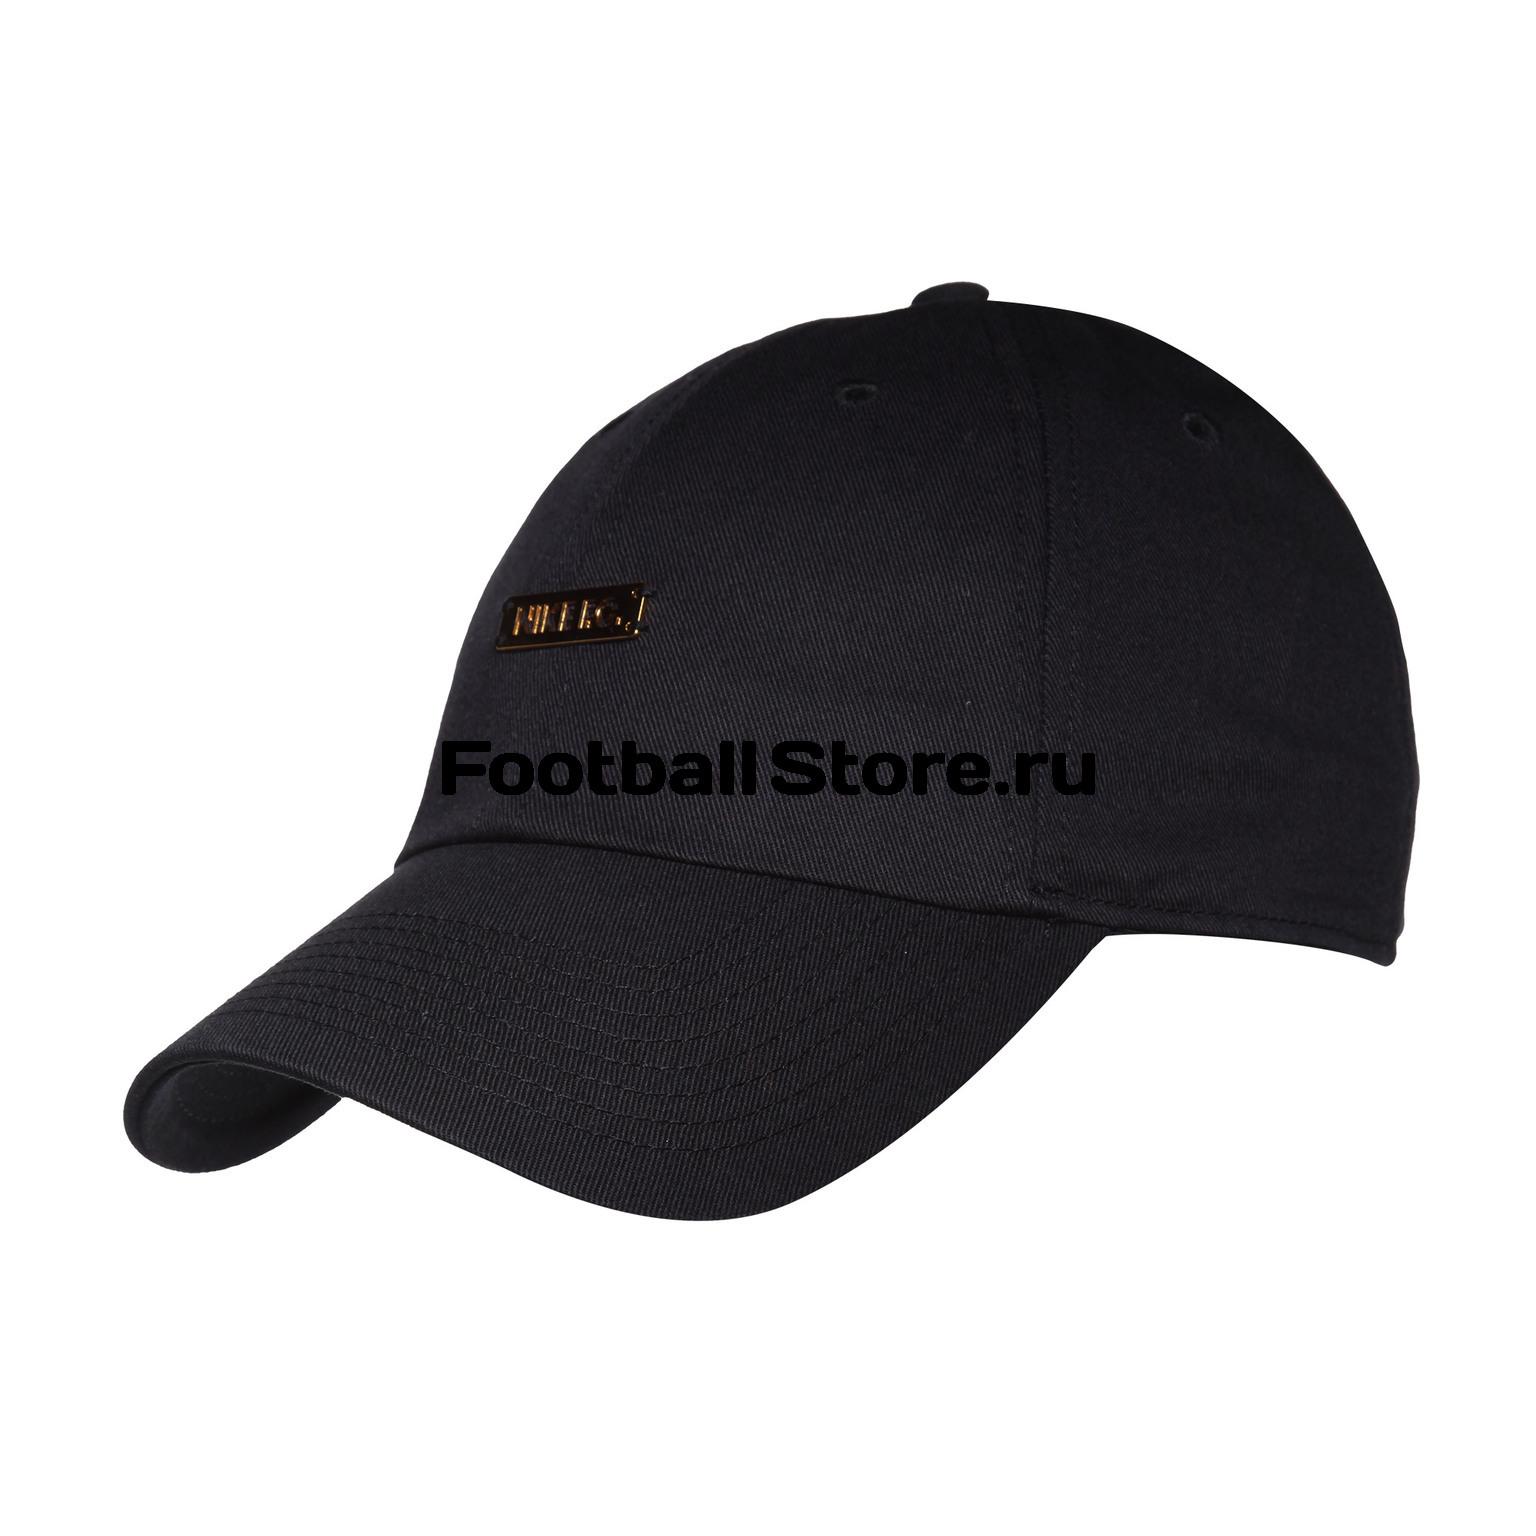 Бейсболка Nike FC AH2241-010